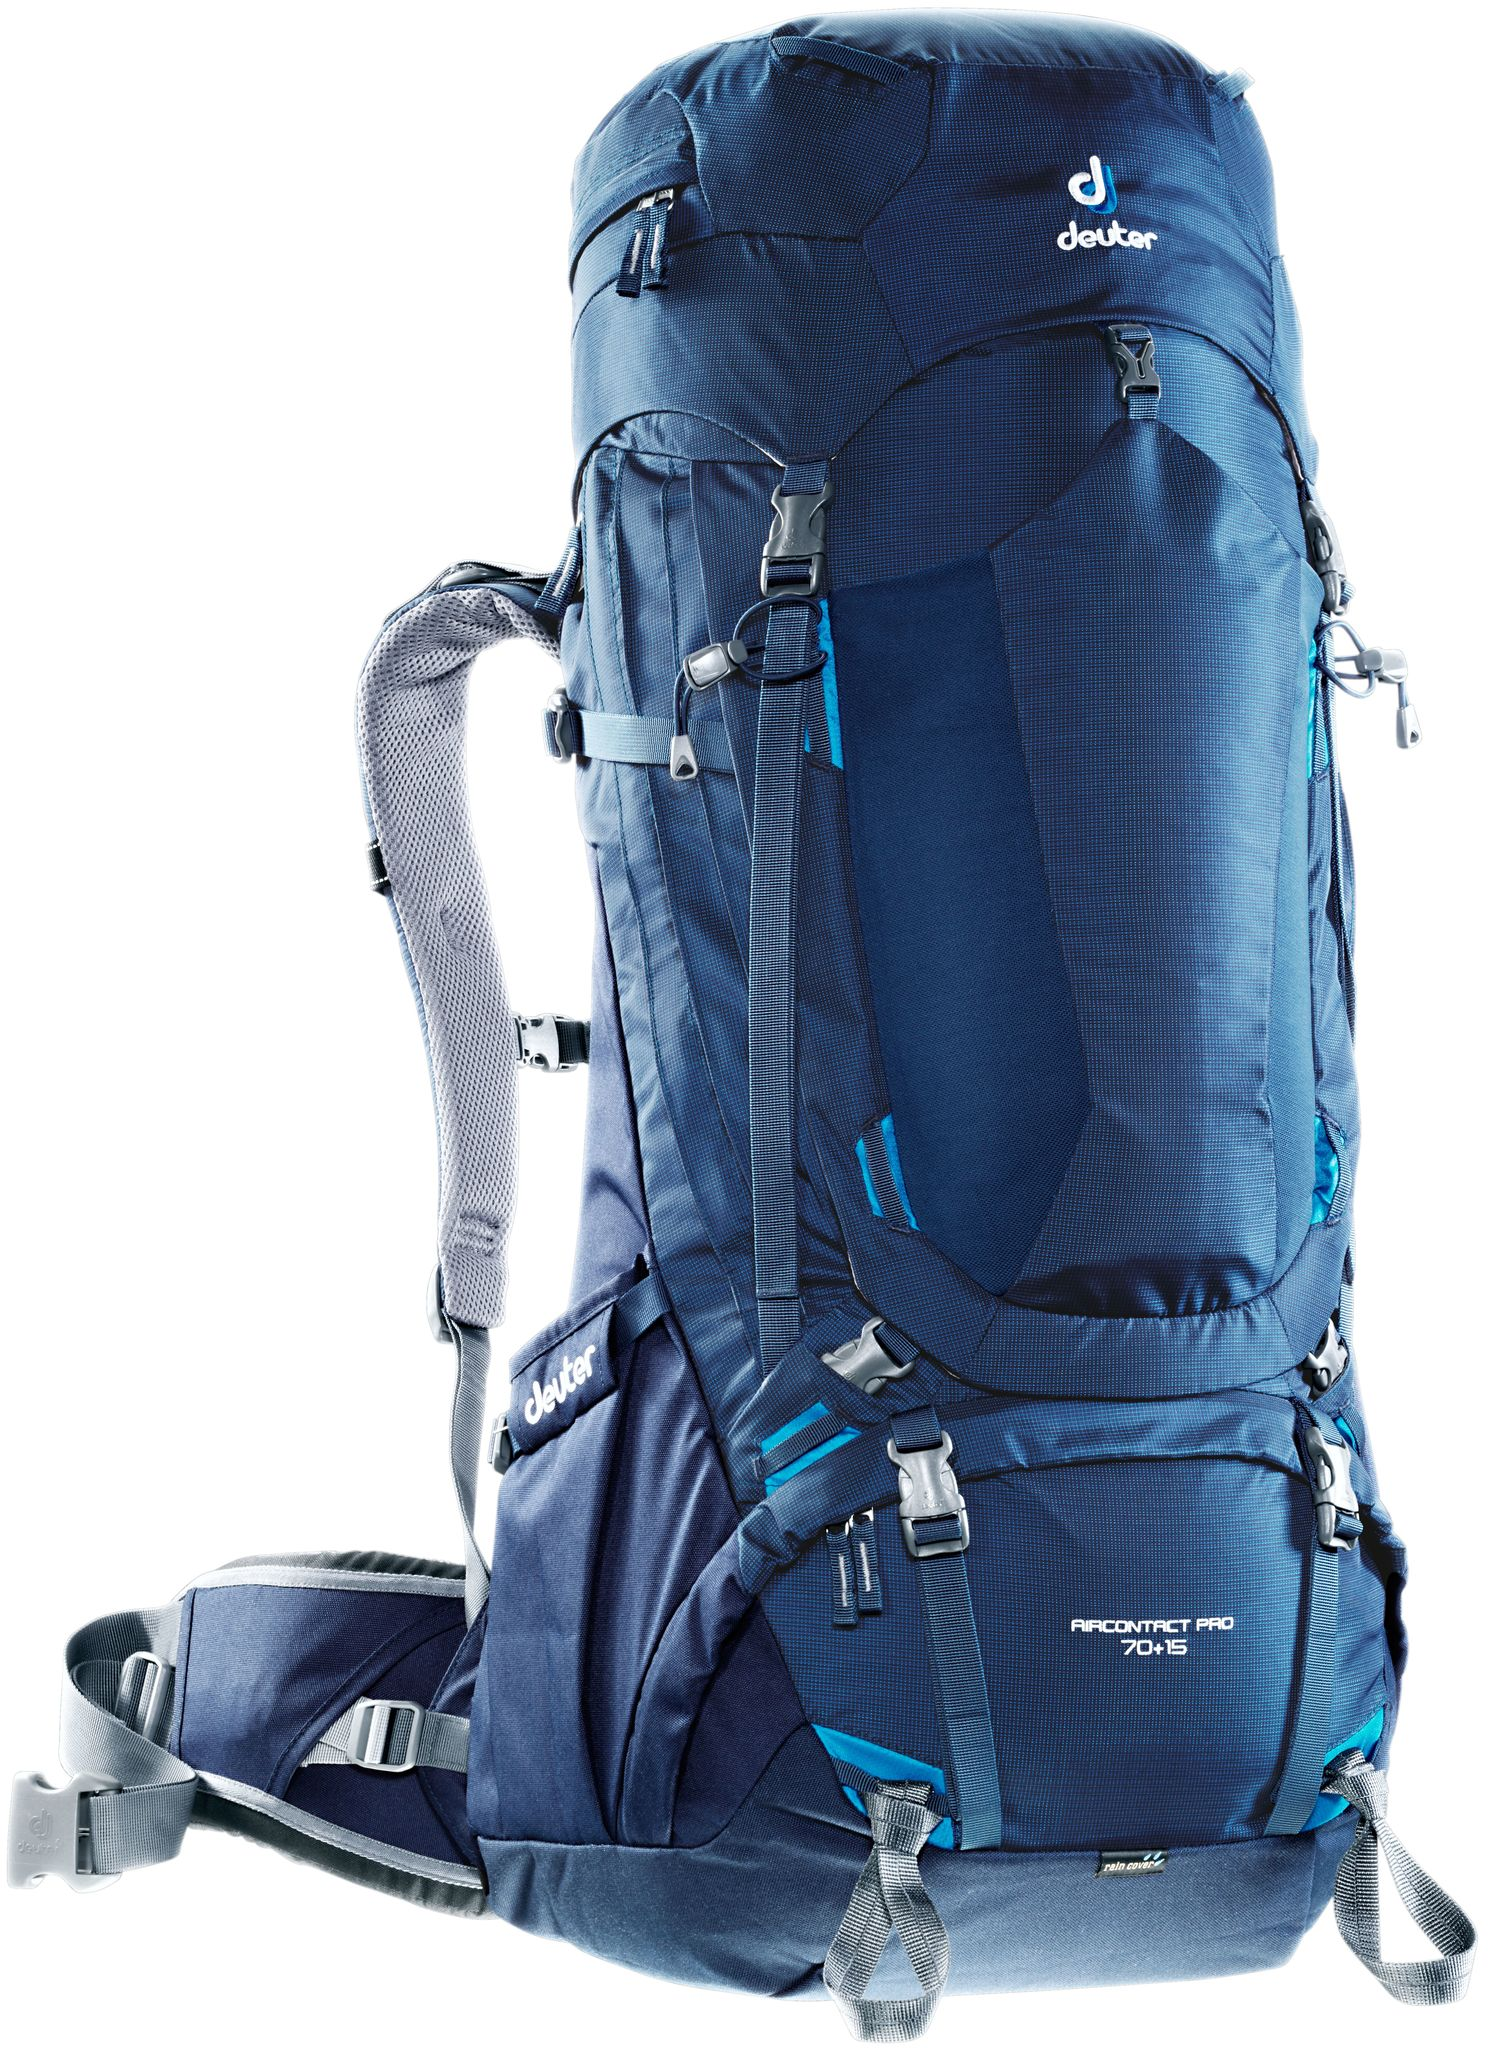 Туристические рюкзаки большие Рюкзак туристический Deuter Aircontact PRO 70 + 15 AircontactPRO70u15-3365-17.jpg